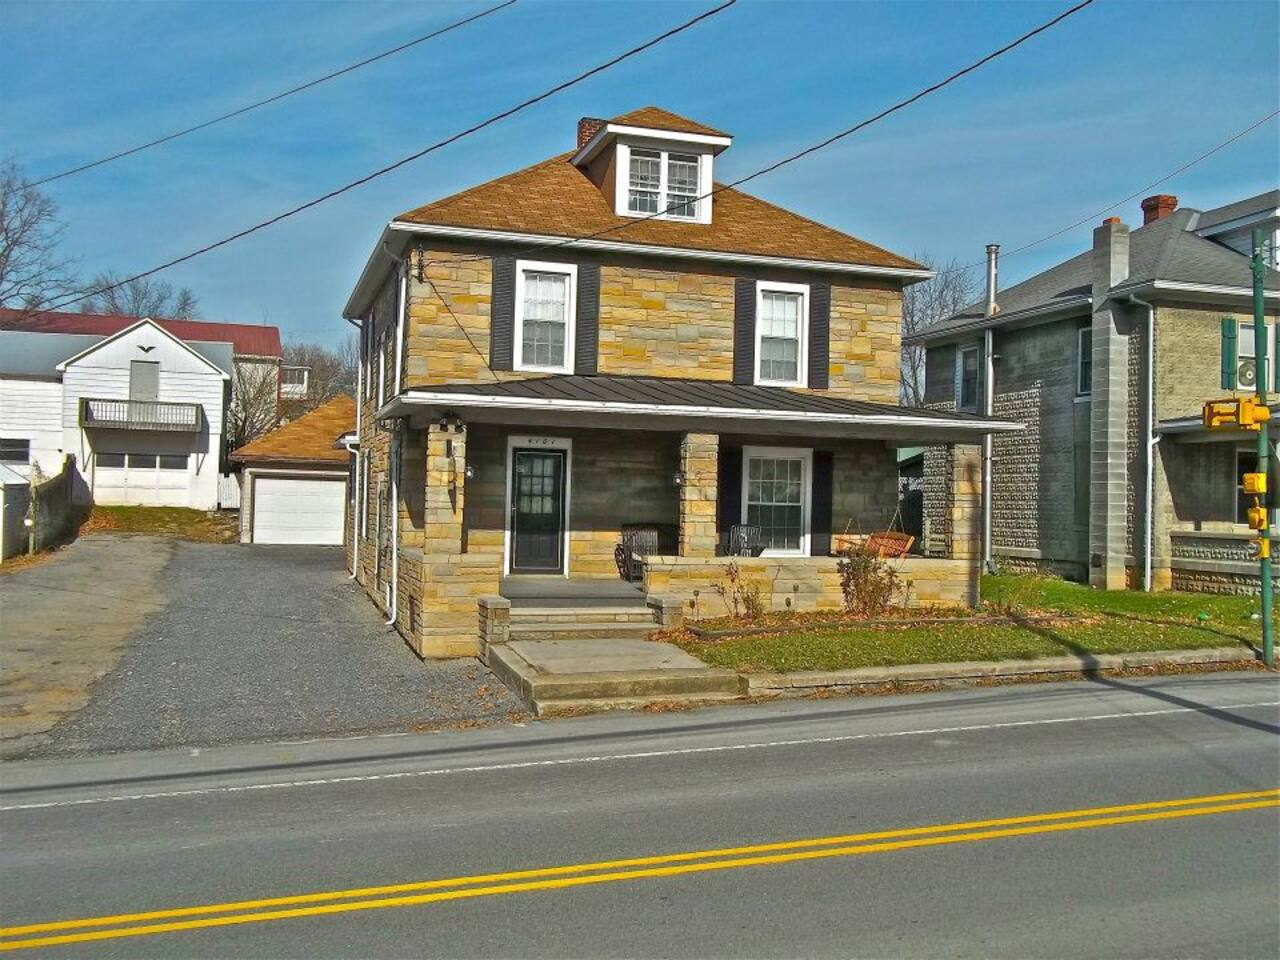 Belleville Private 4BR/1.5 Ba House